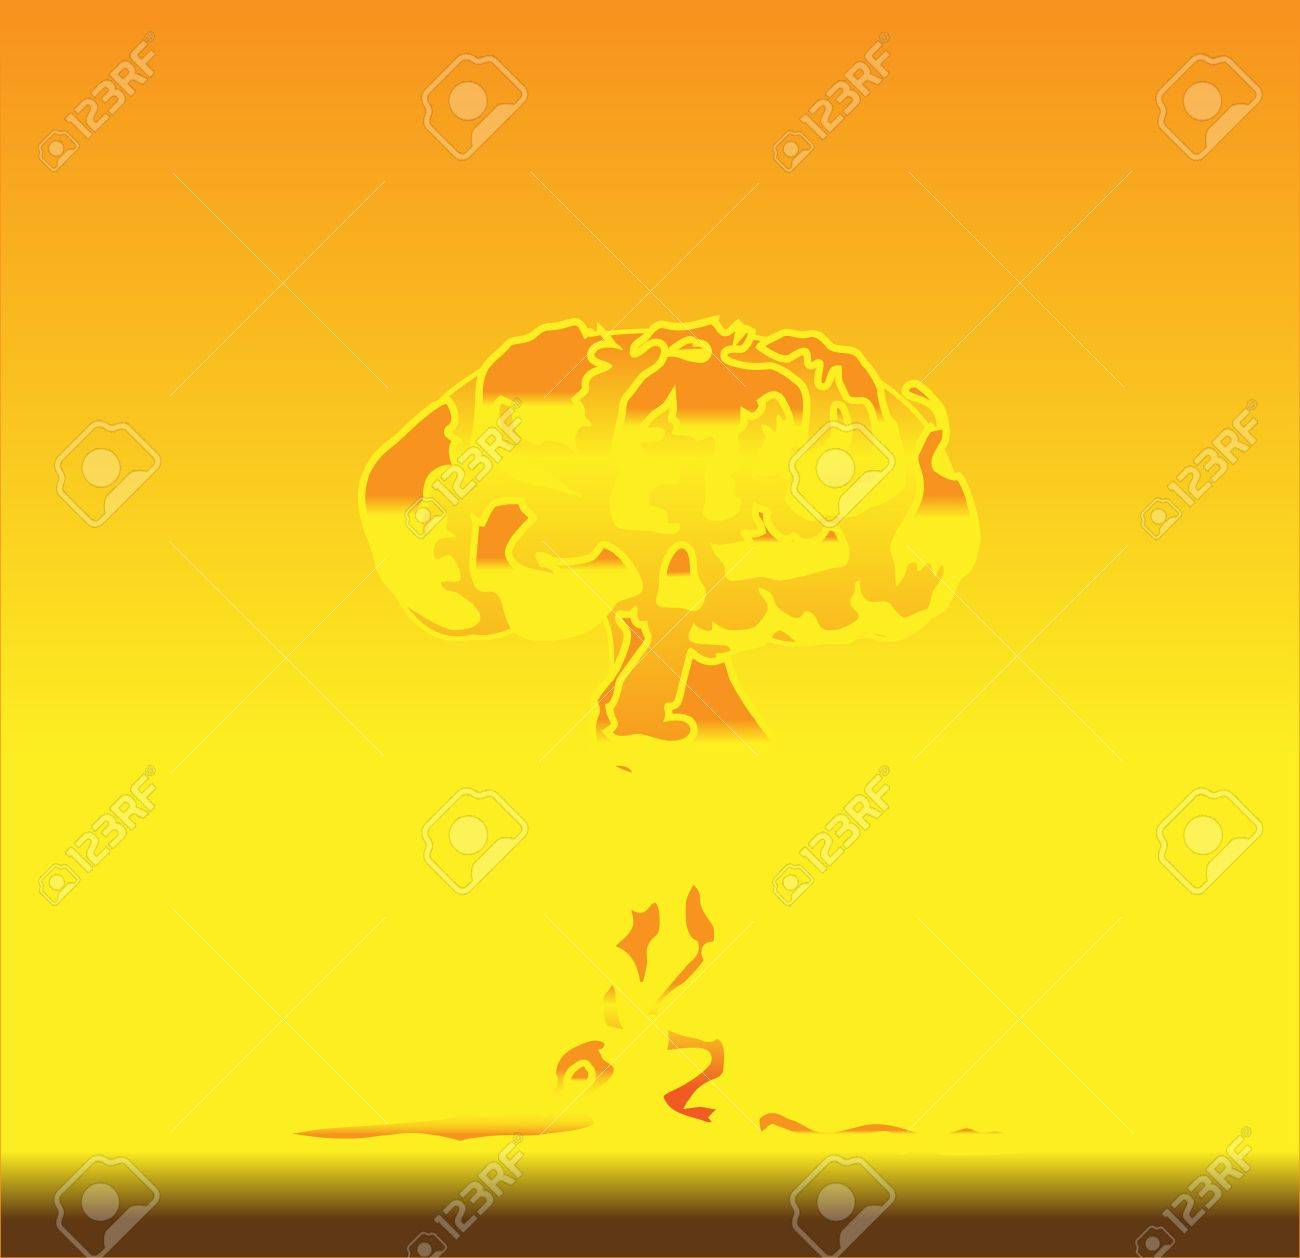 illustration of mushroom after nuclear explosion Stock Vector - 16878368